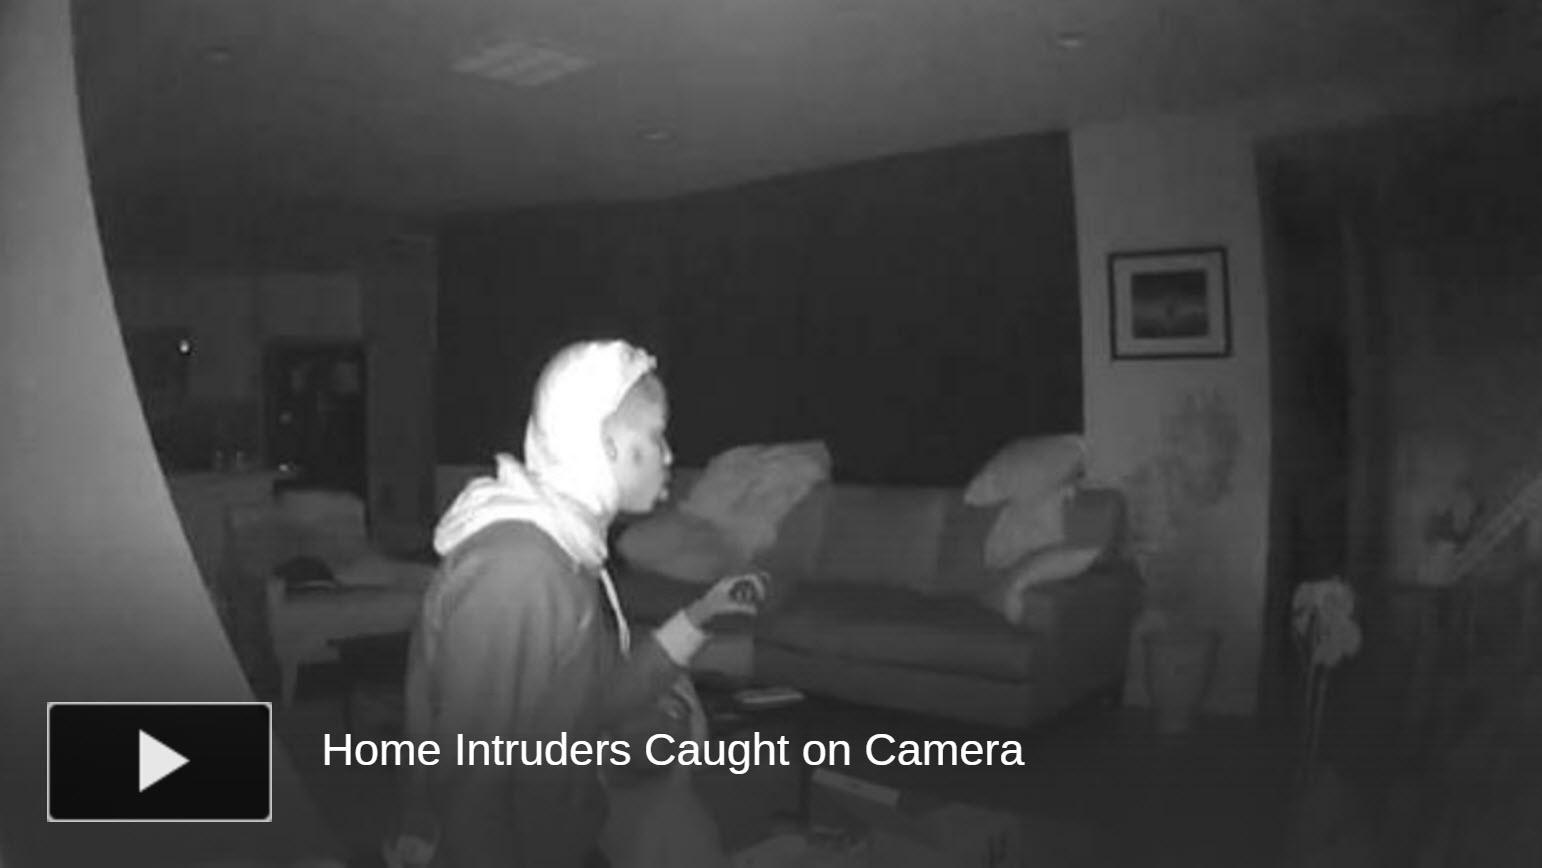 Virtual Police intruders